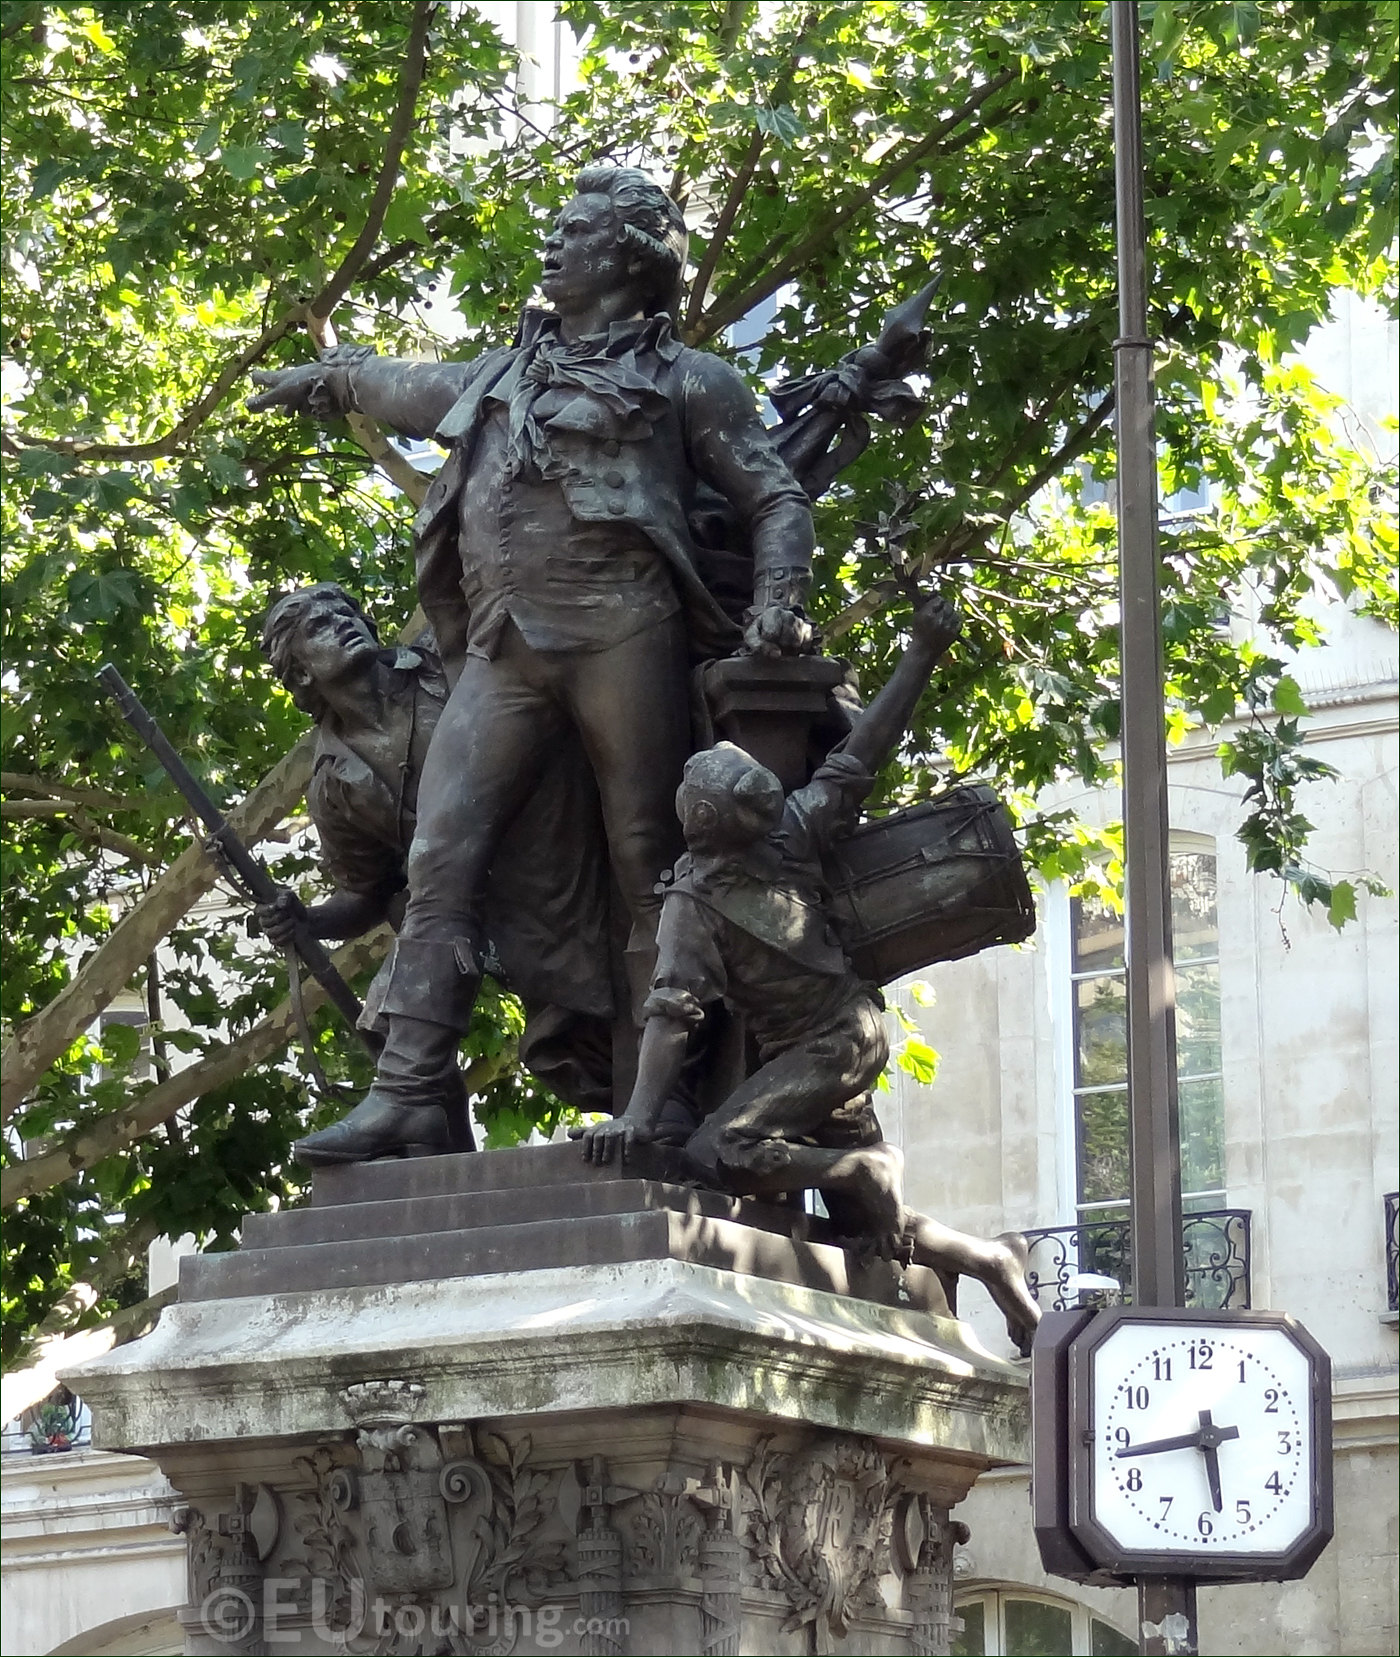 Georges Danton hd photo of georges jacques danton statue in paris - page 63